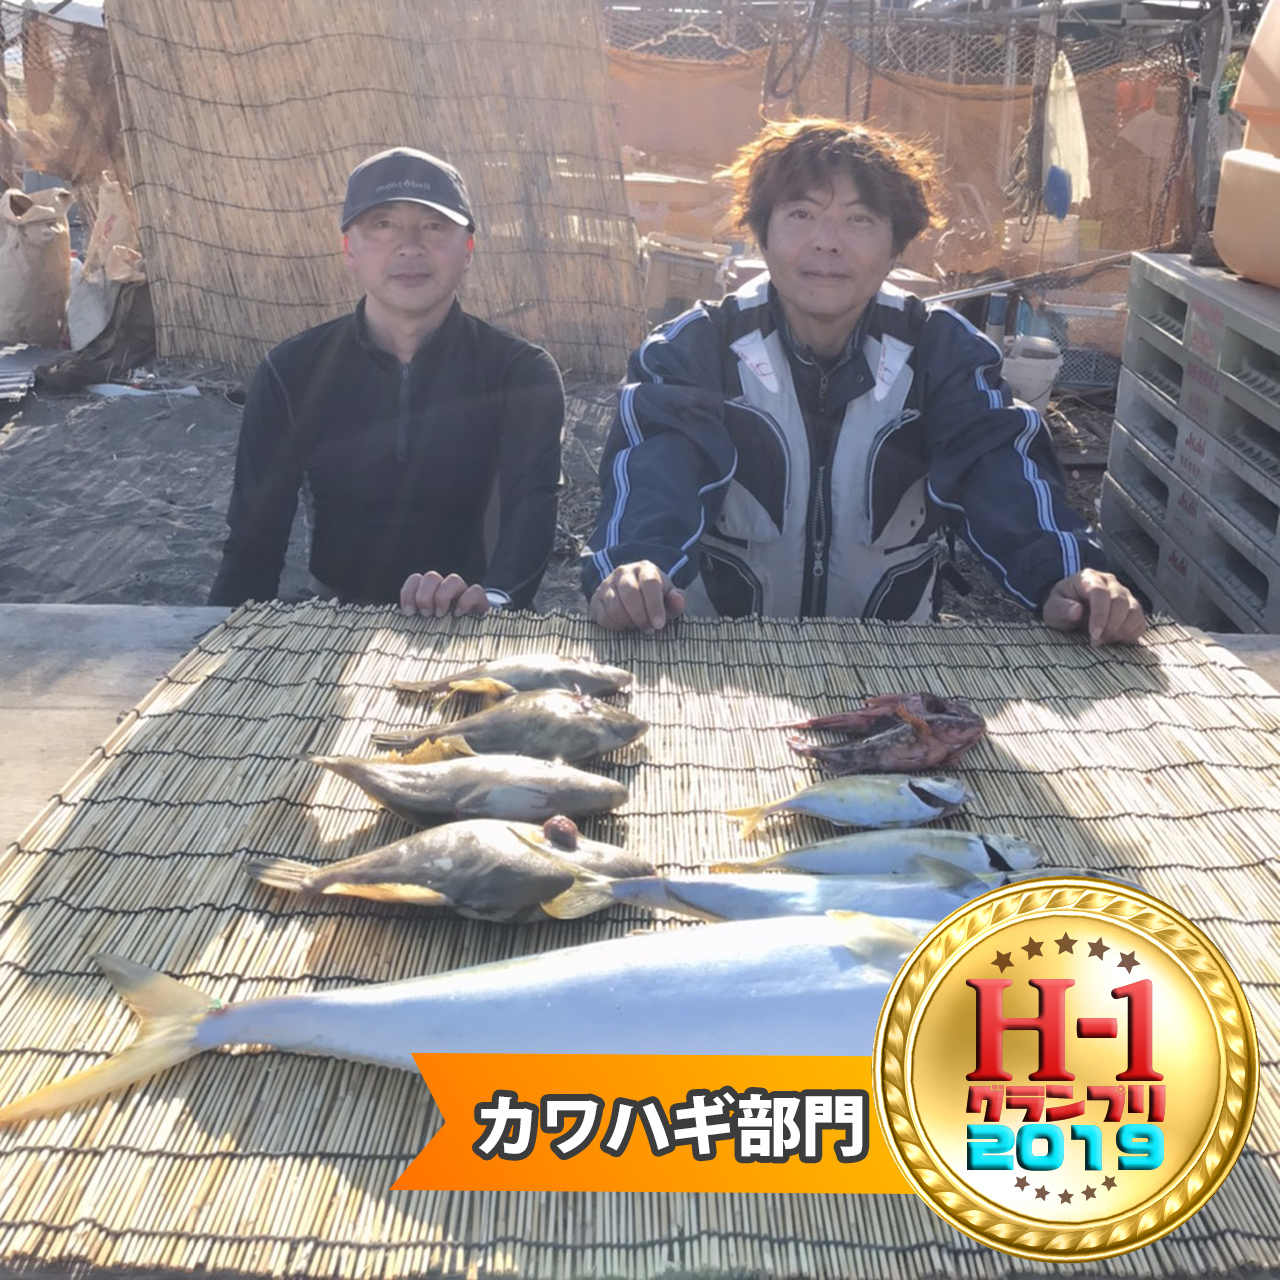 H1グランプリカワハギ部門賞